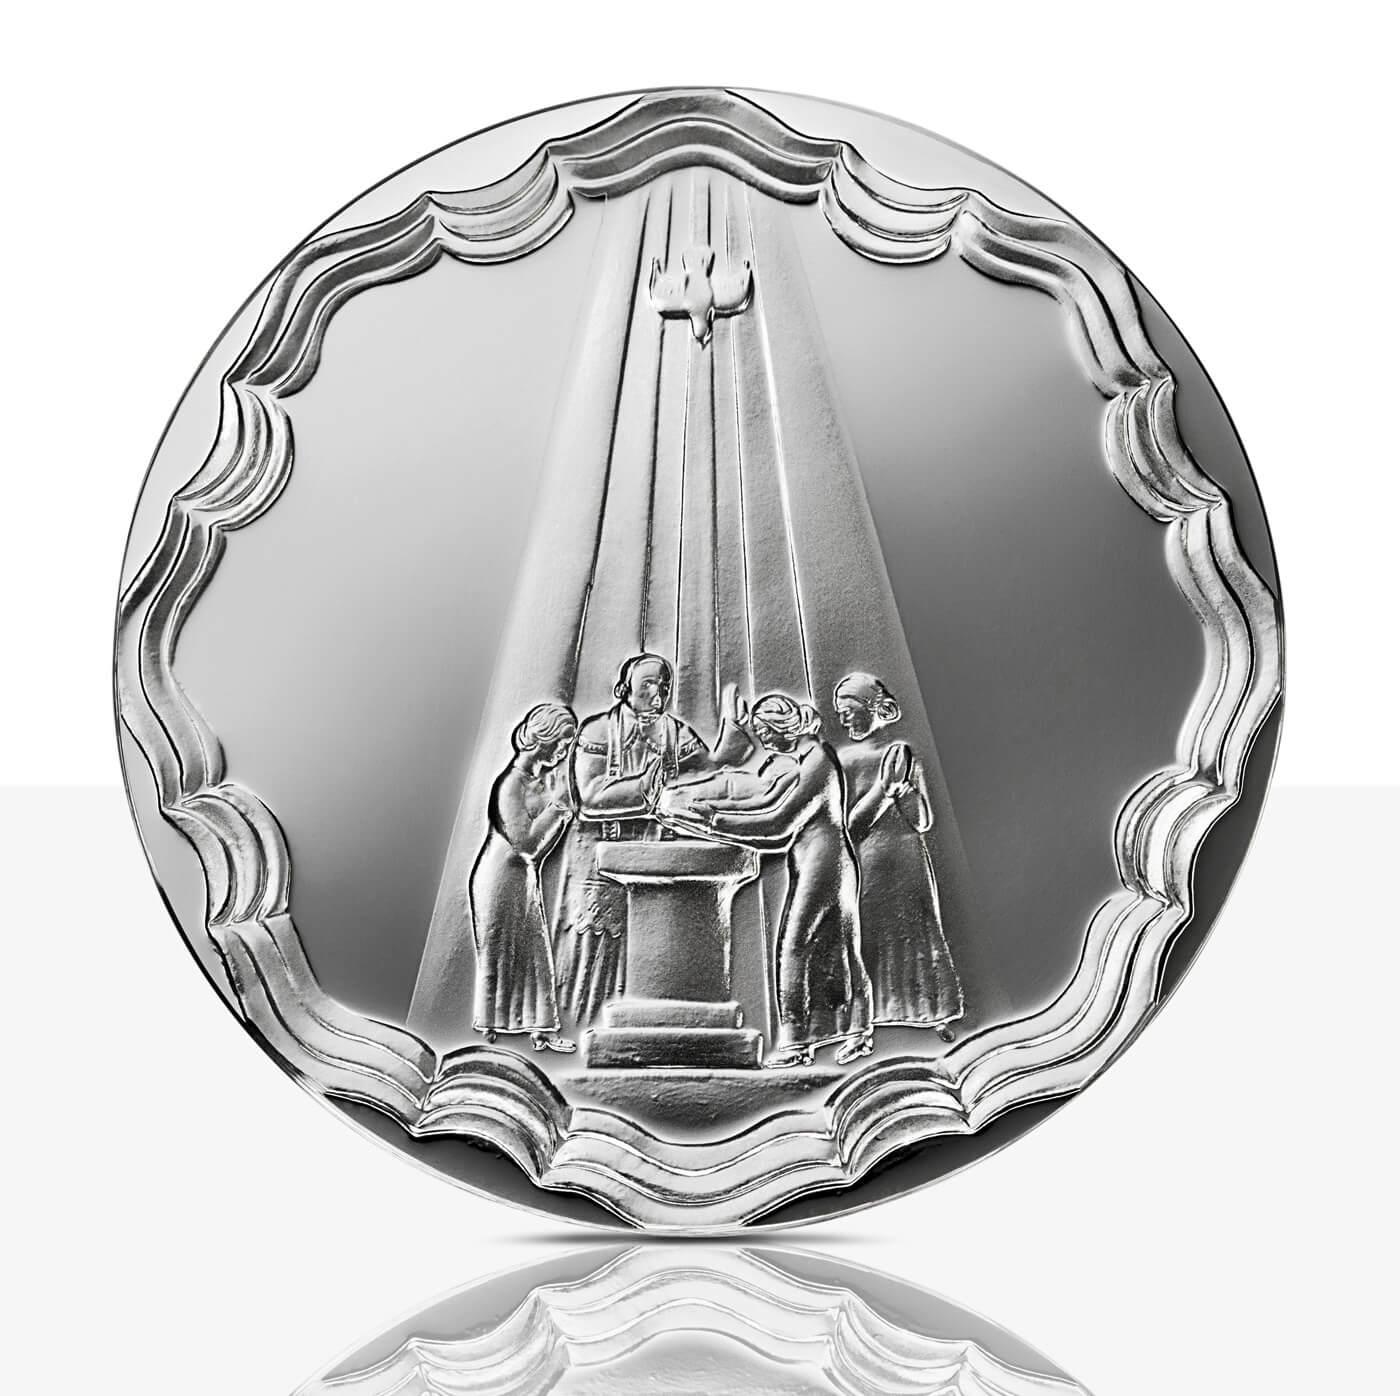 Baptism Medal Fine Silver Proof Staatliche Münzen Baden Württemberg